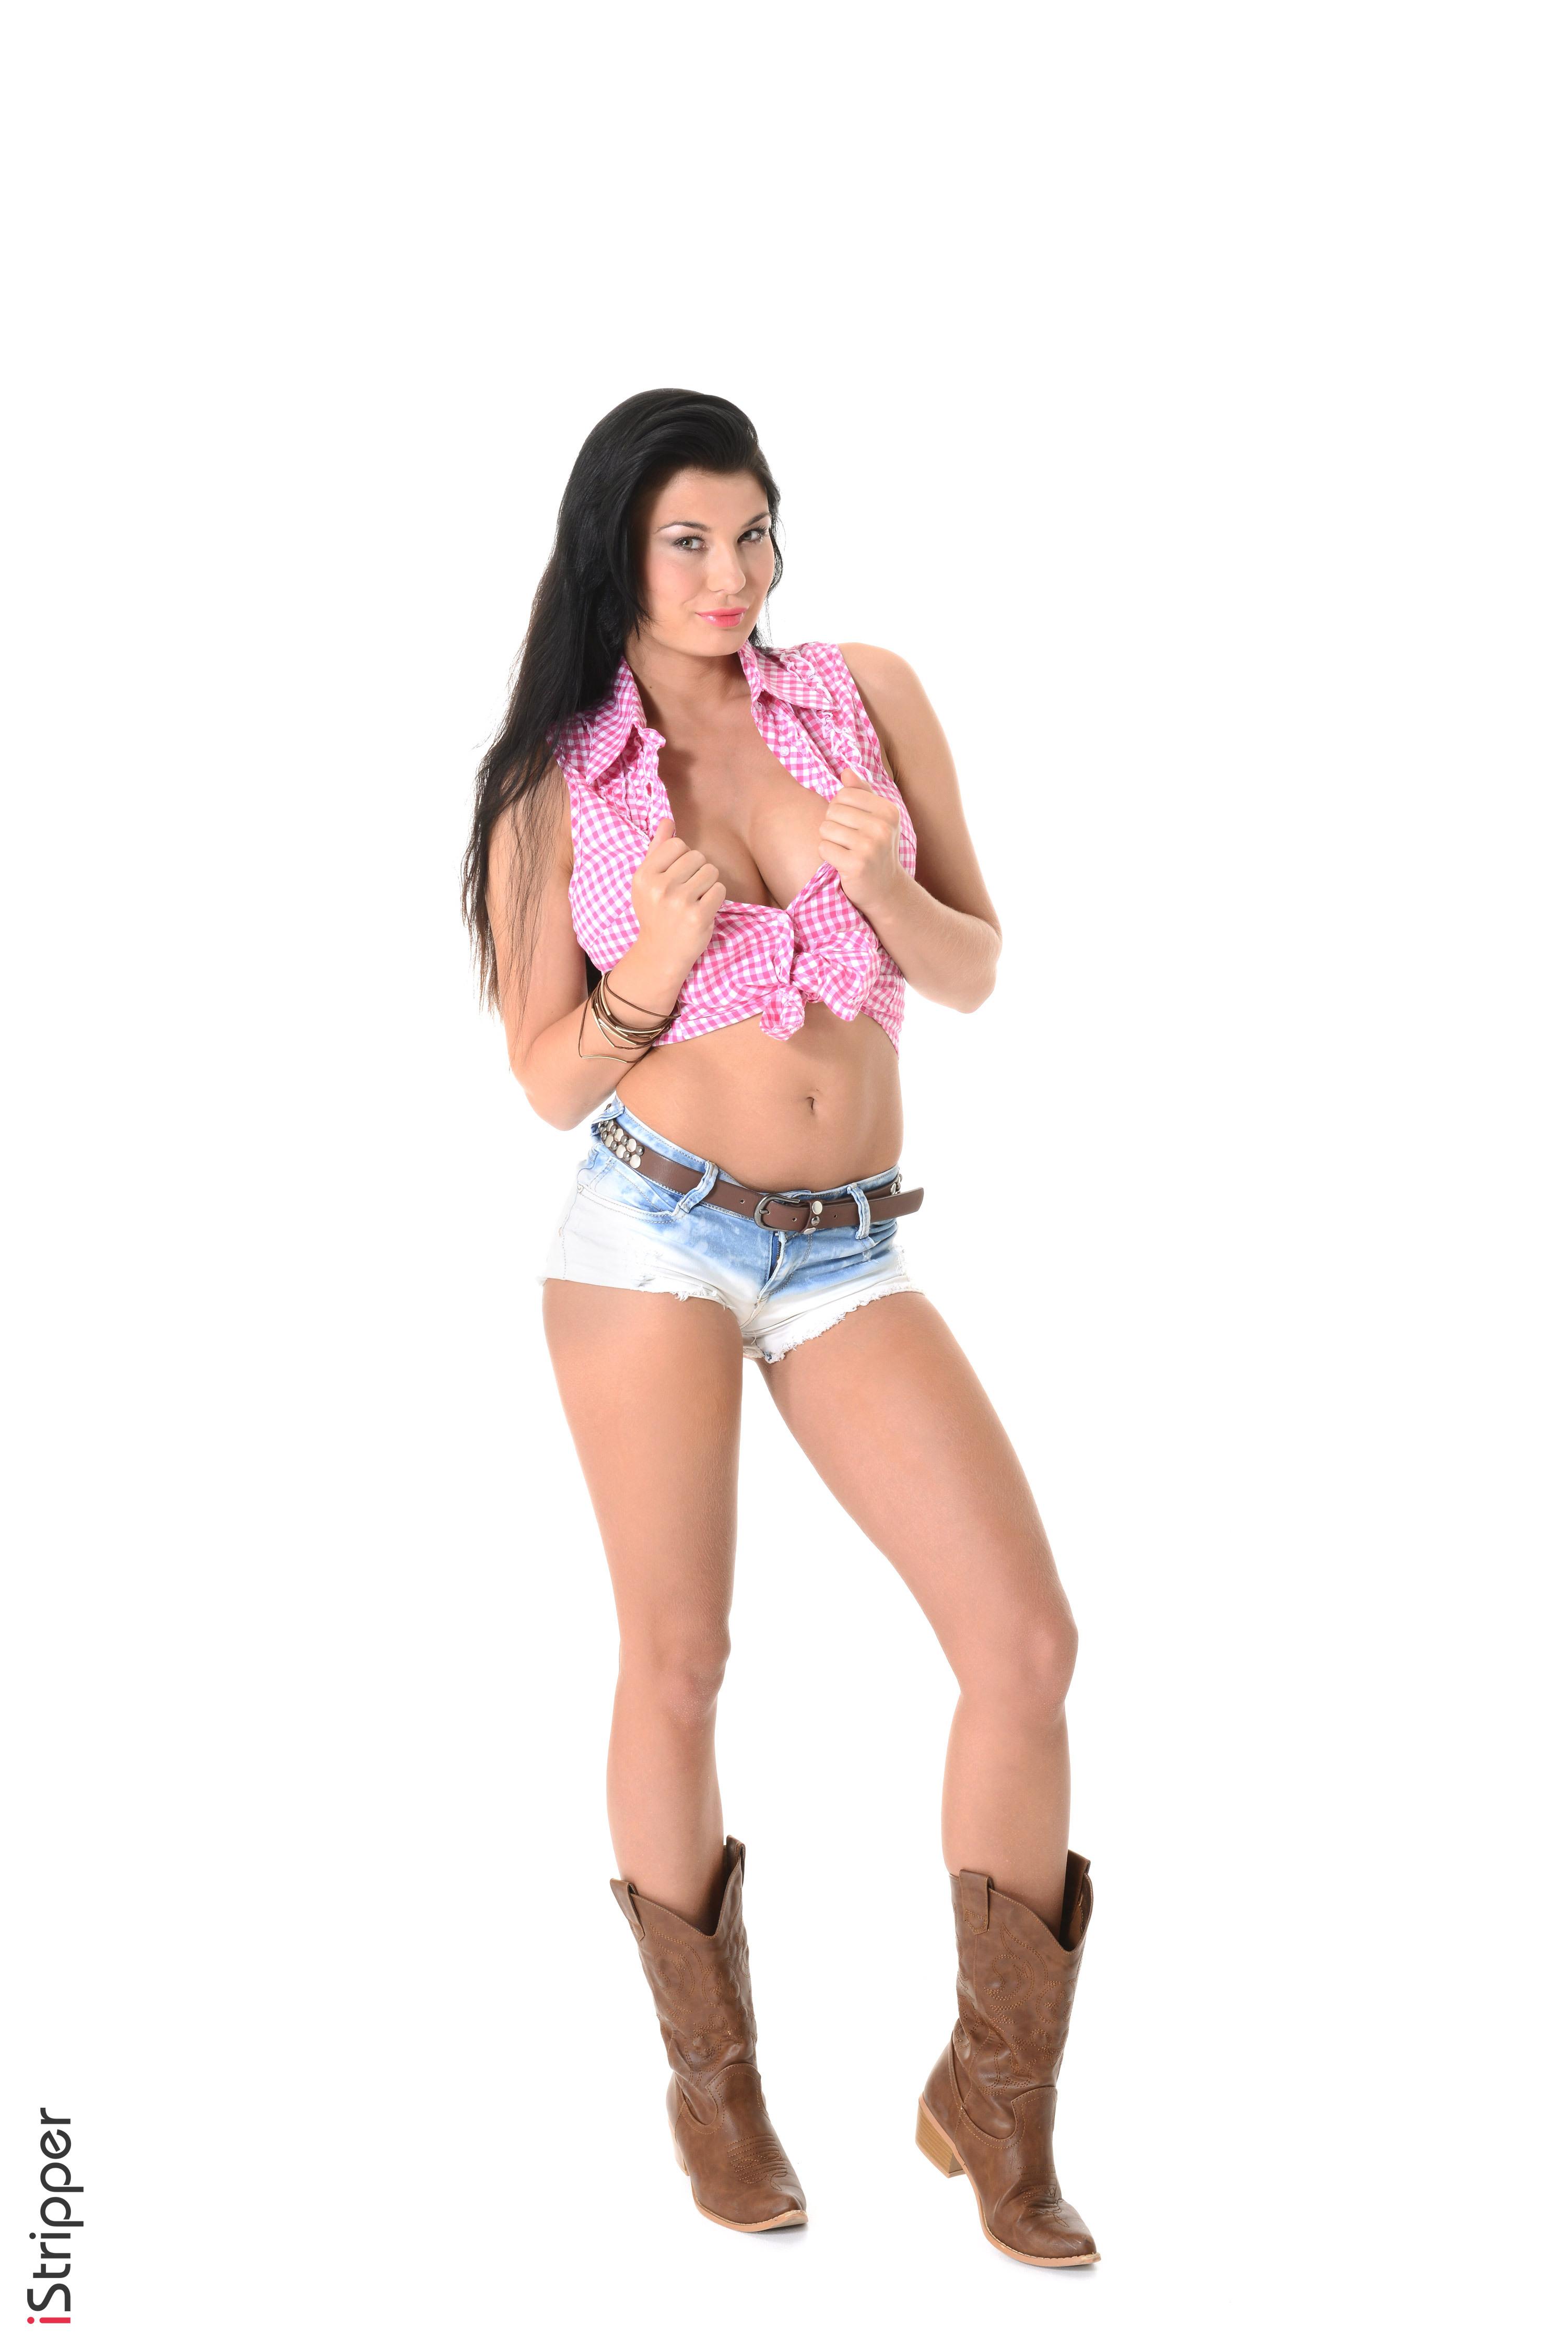 3003x4500,Lucy Li,iStripper,白色背景,黑发,手,腹,短裤,腿,靴,年輕女性,女孩,